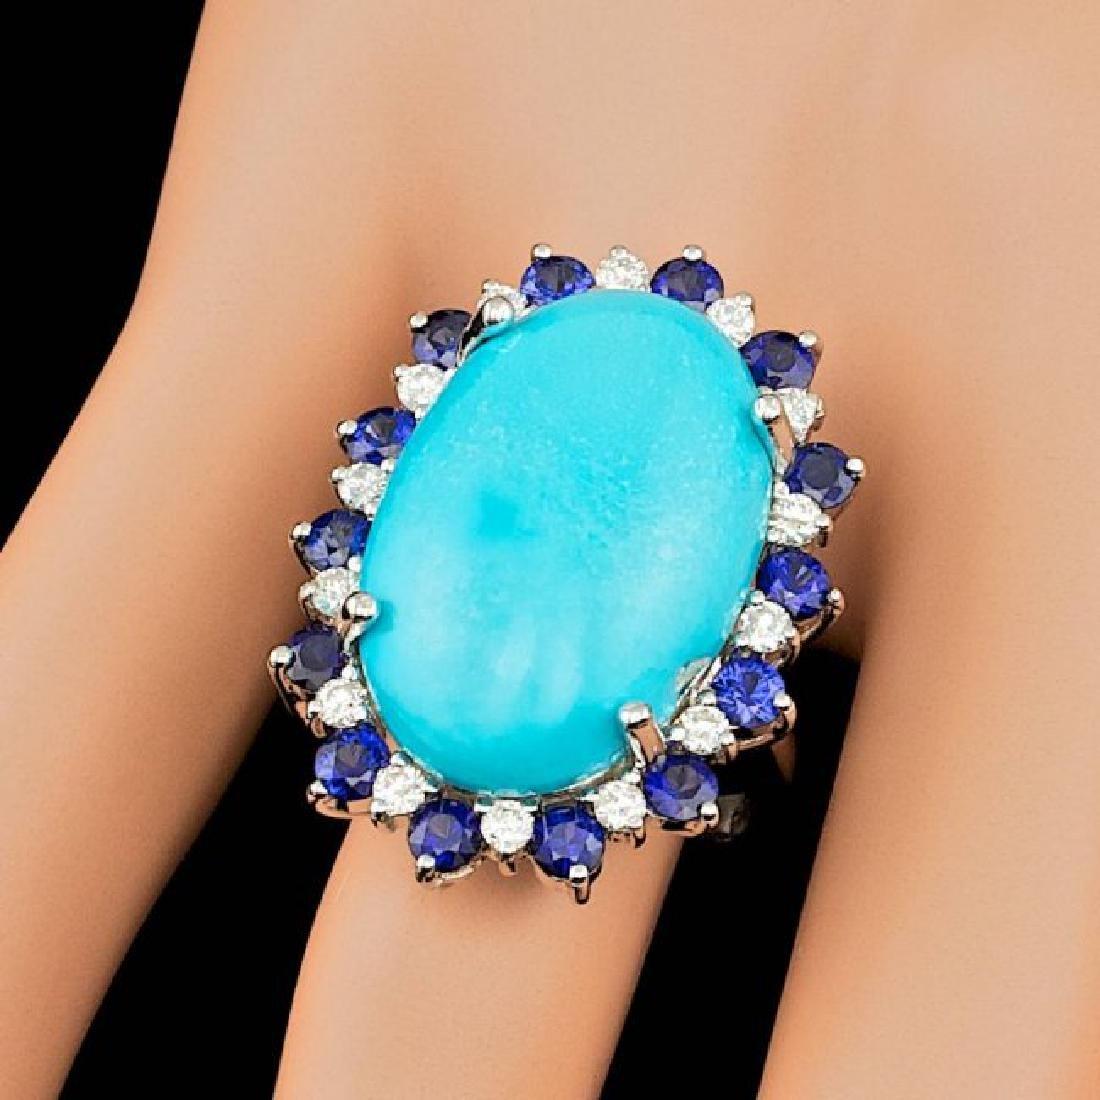 14k Gold 17.50ct Turquoise 0.60ct Diamond Ring - 4